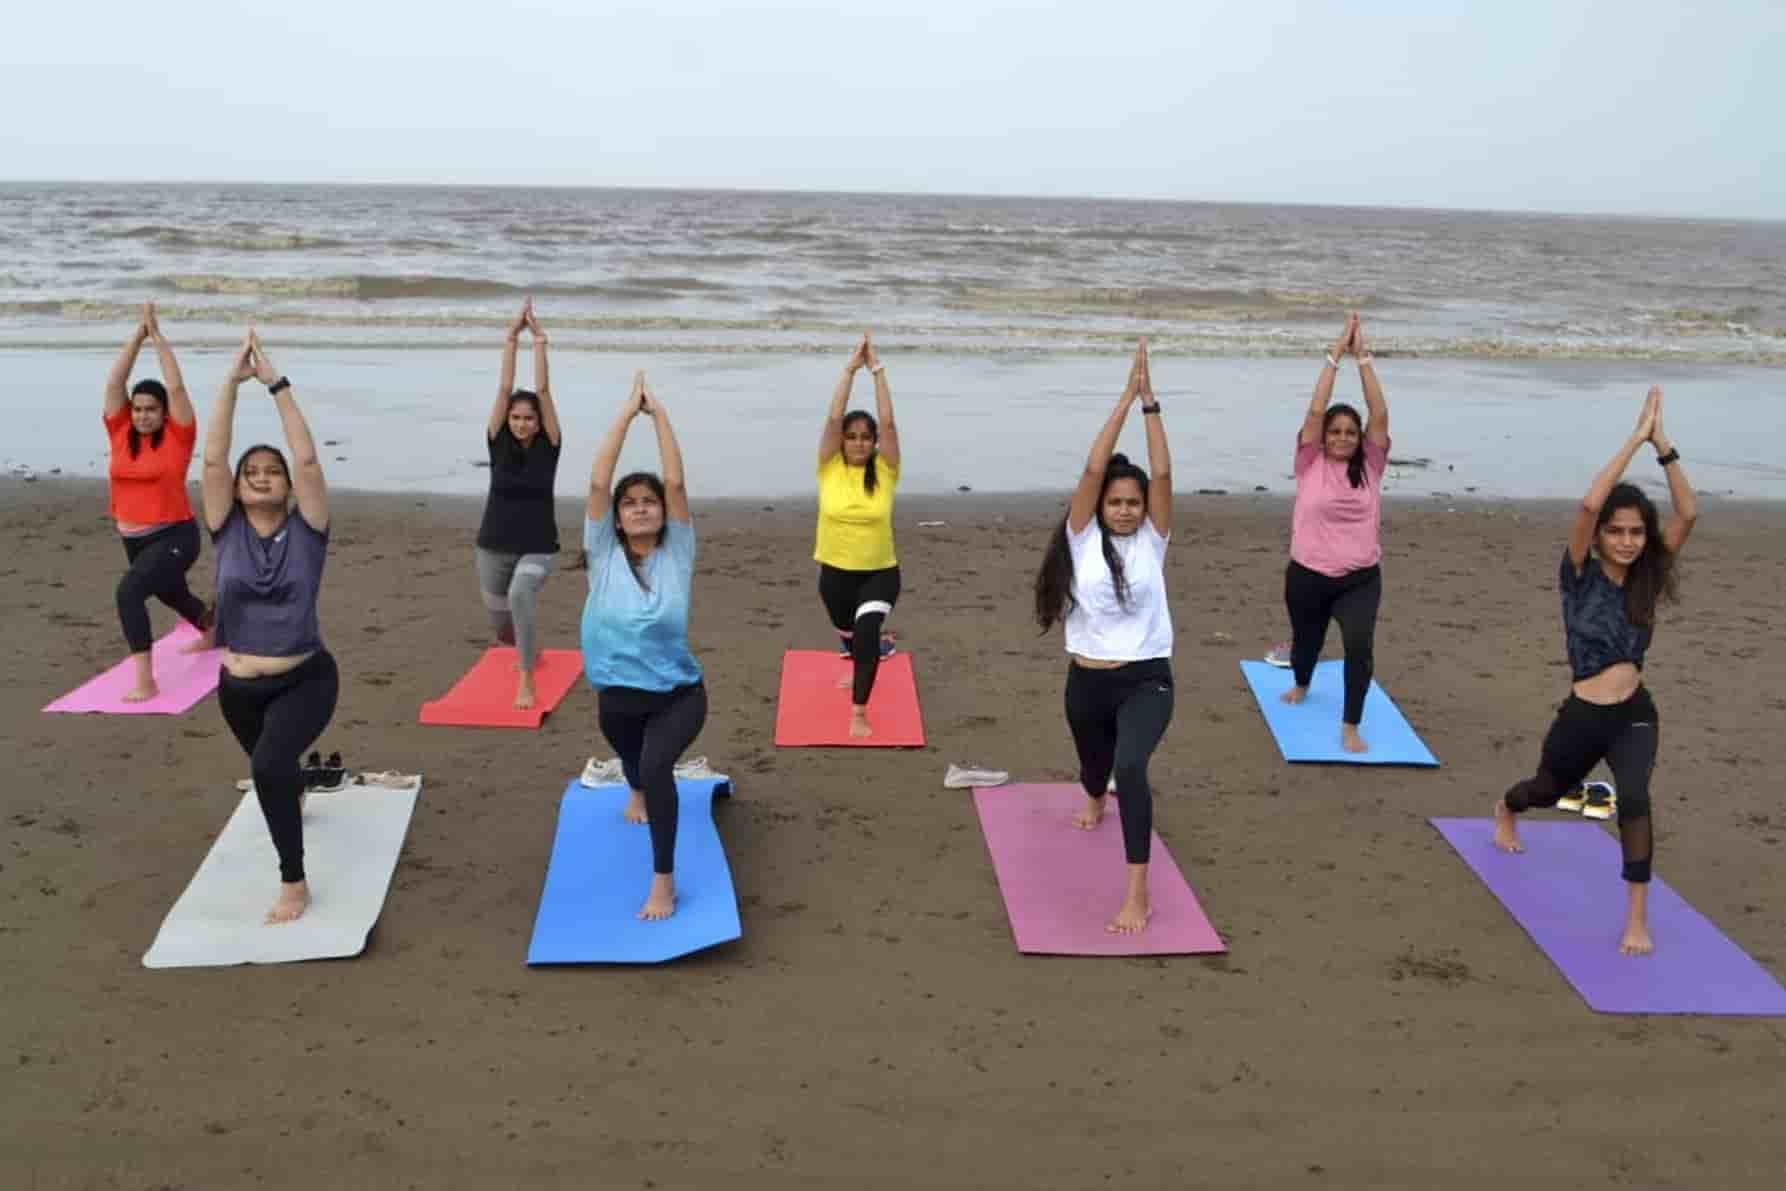 Surat women perform Yoga at a beach on Saturday.